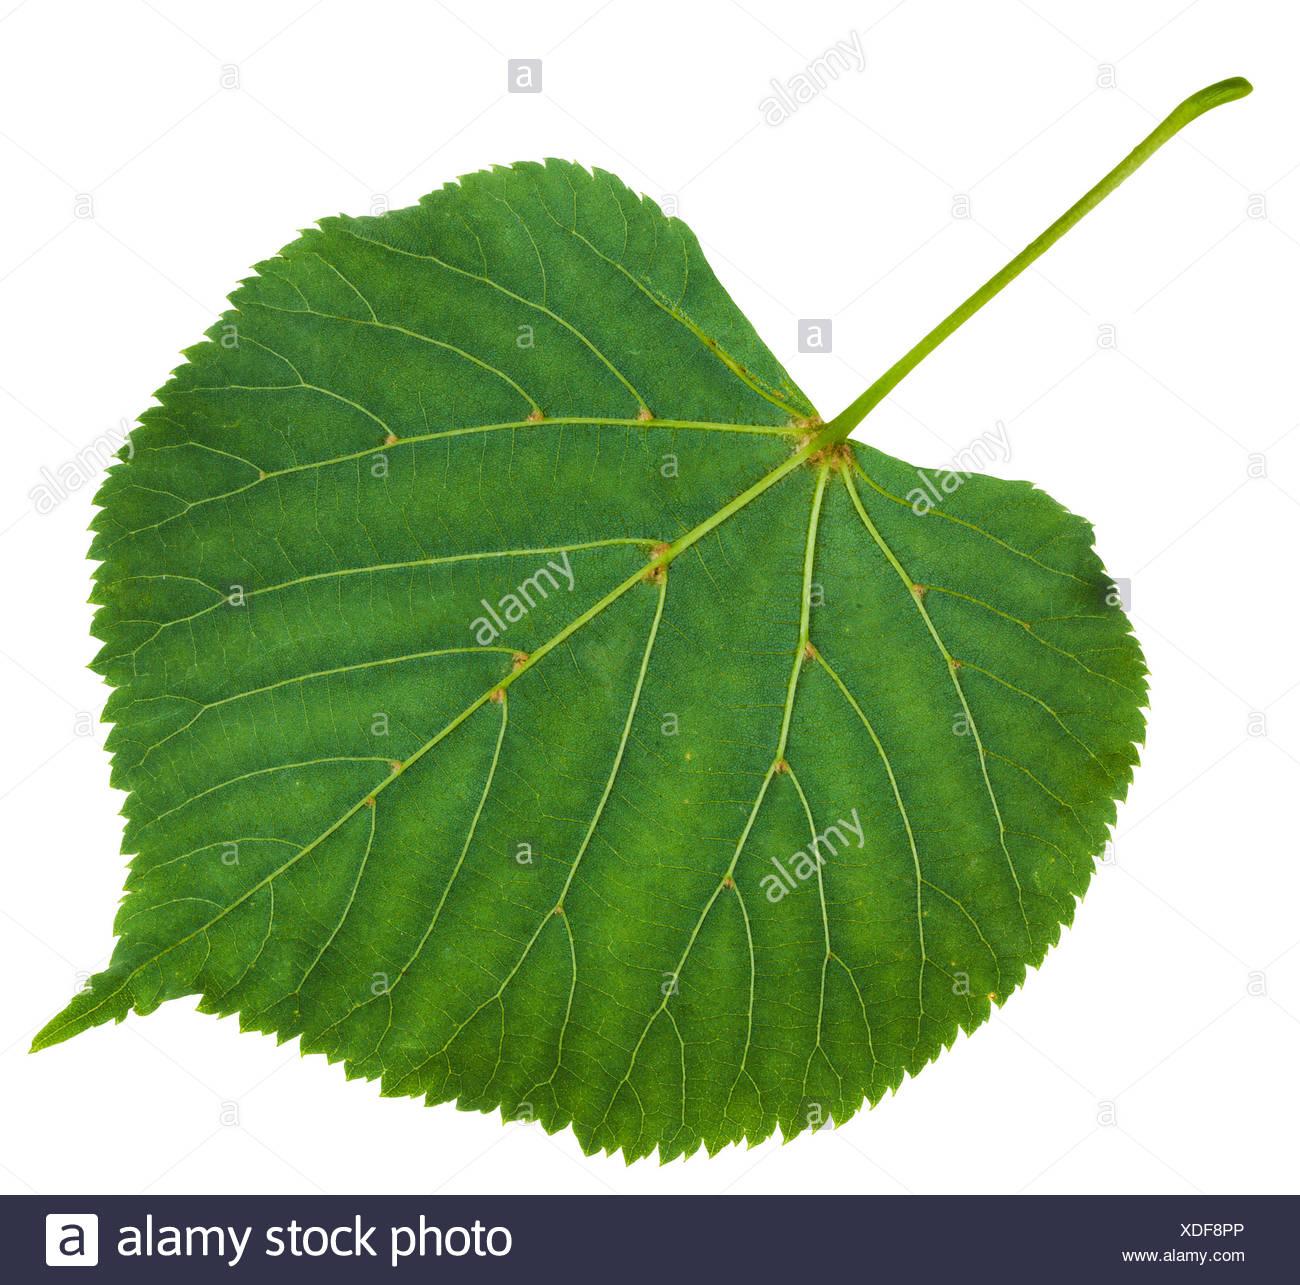 back side of green leaf of Tilia platyphyllos tree Stock Photo